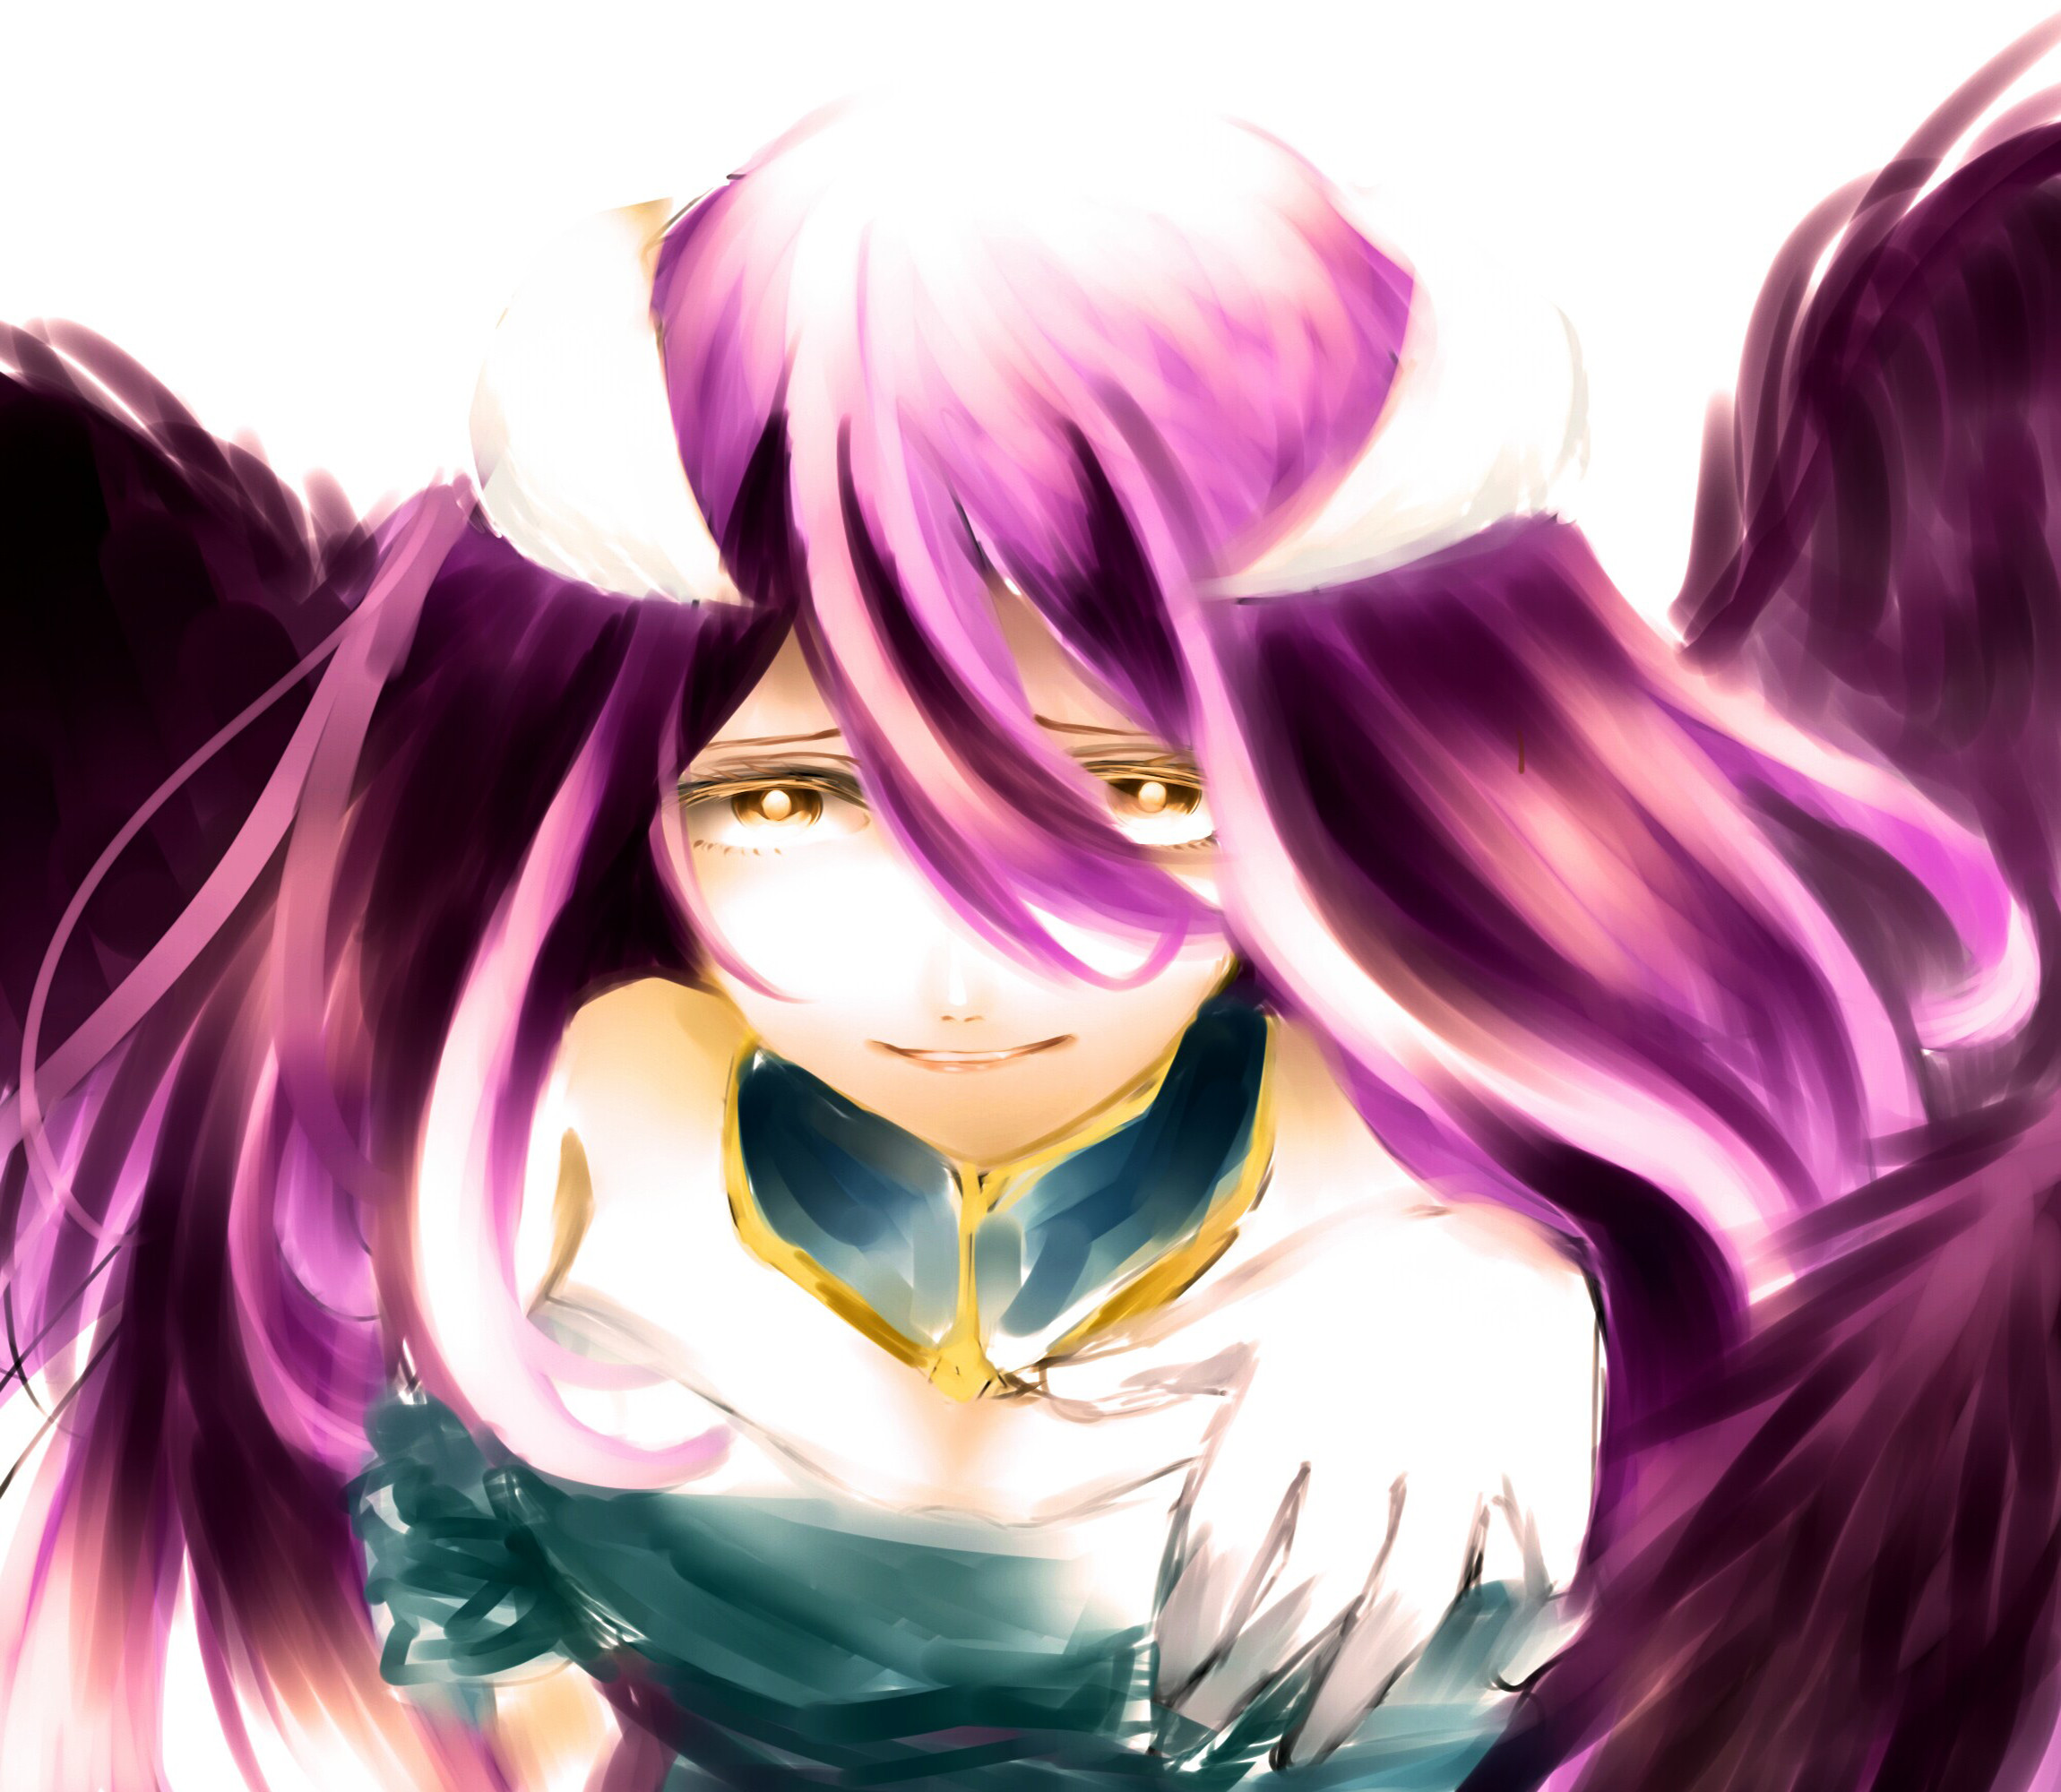 Anime Overlord Overlord Albedo Wallpaper